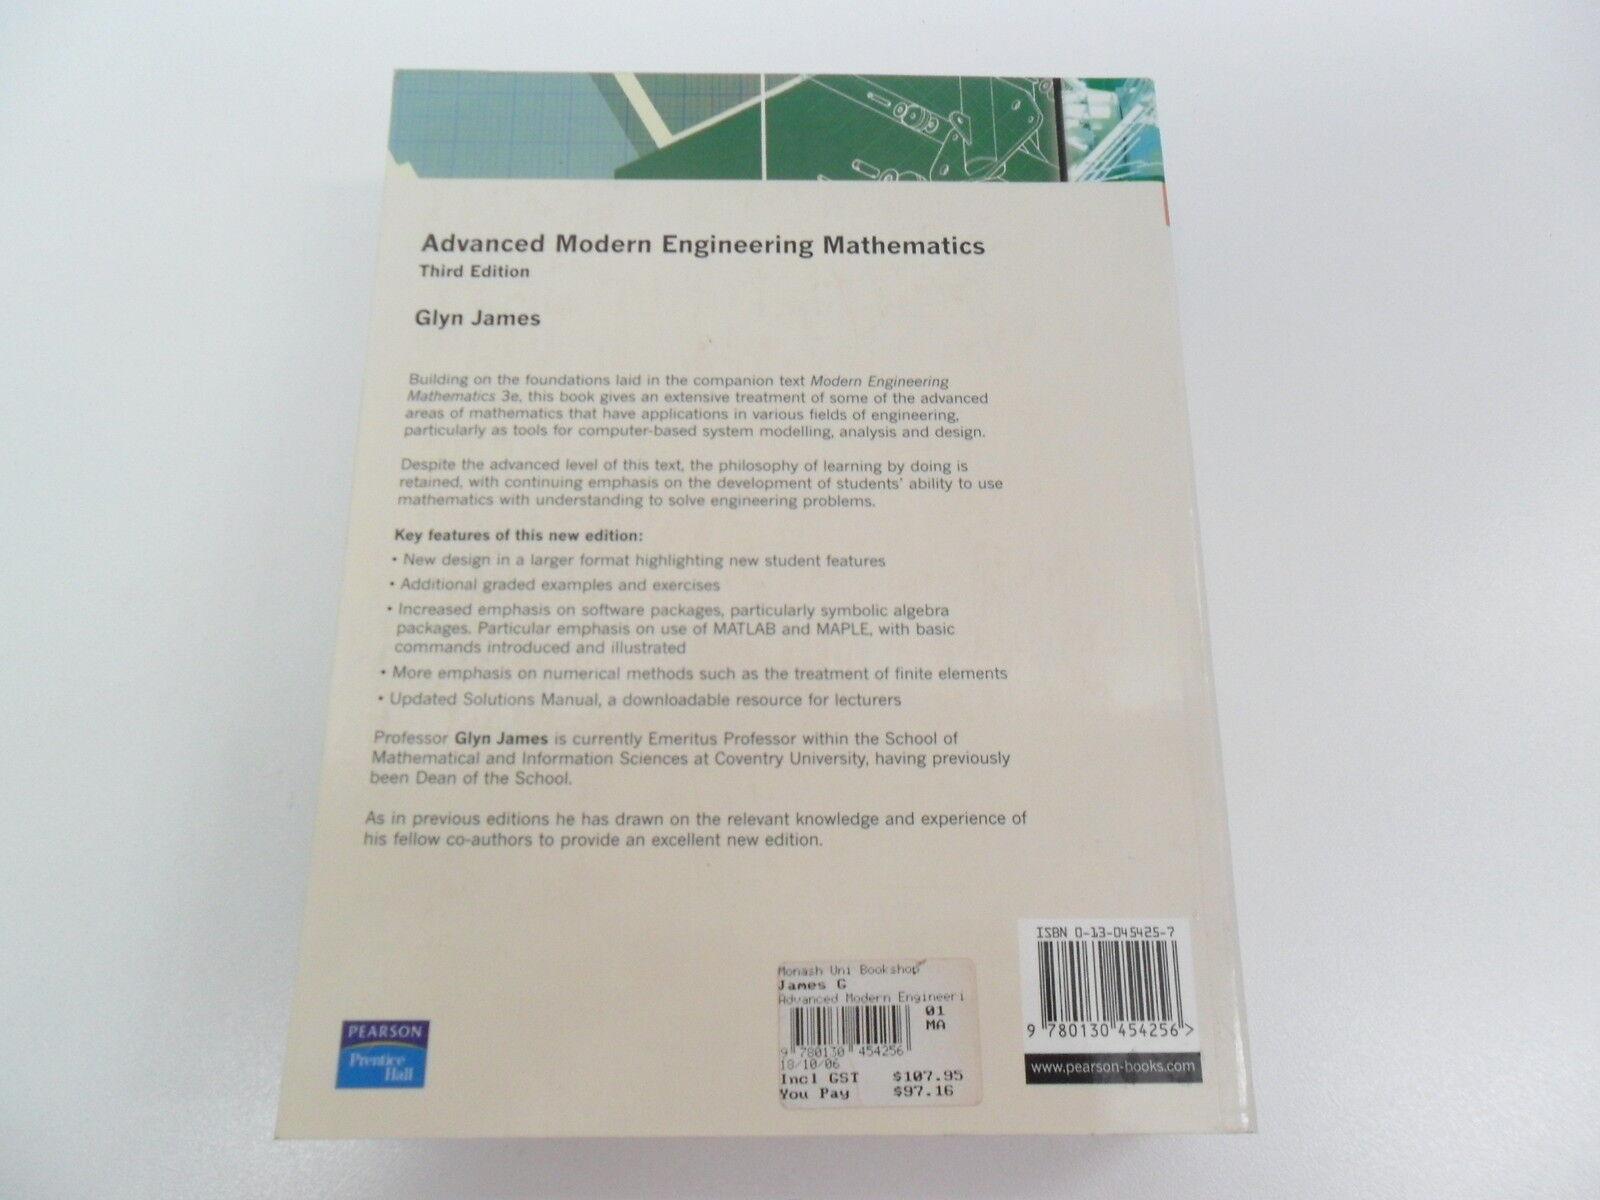 WRG-1822] Modern Engineering Mathematics Solutions Manual Glyn James